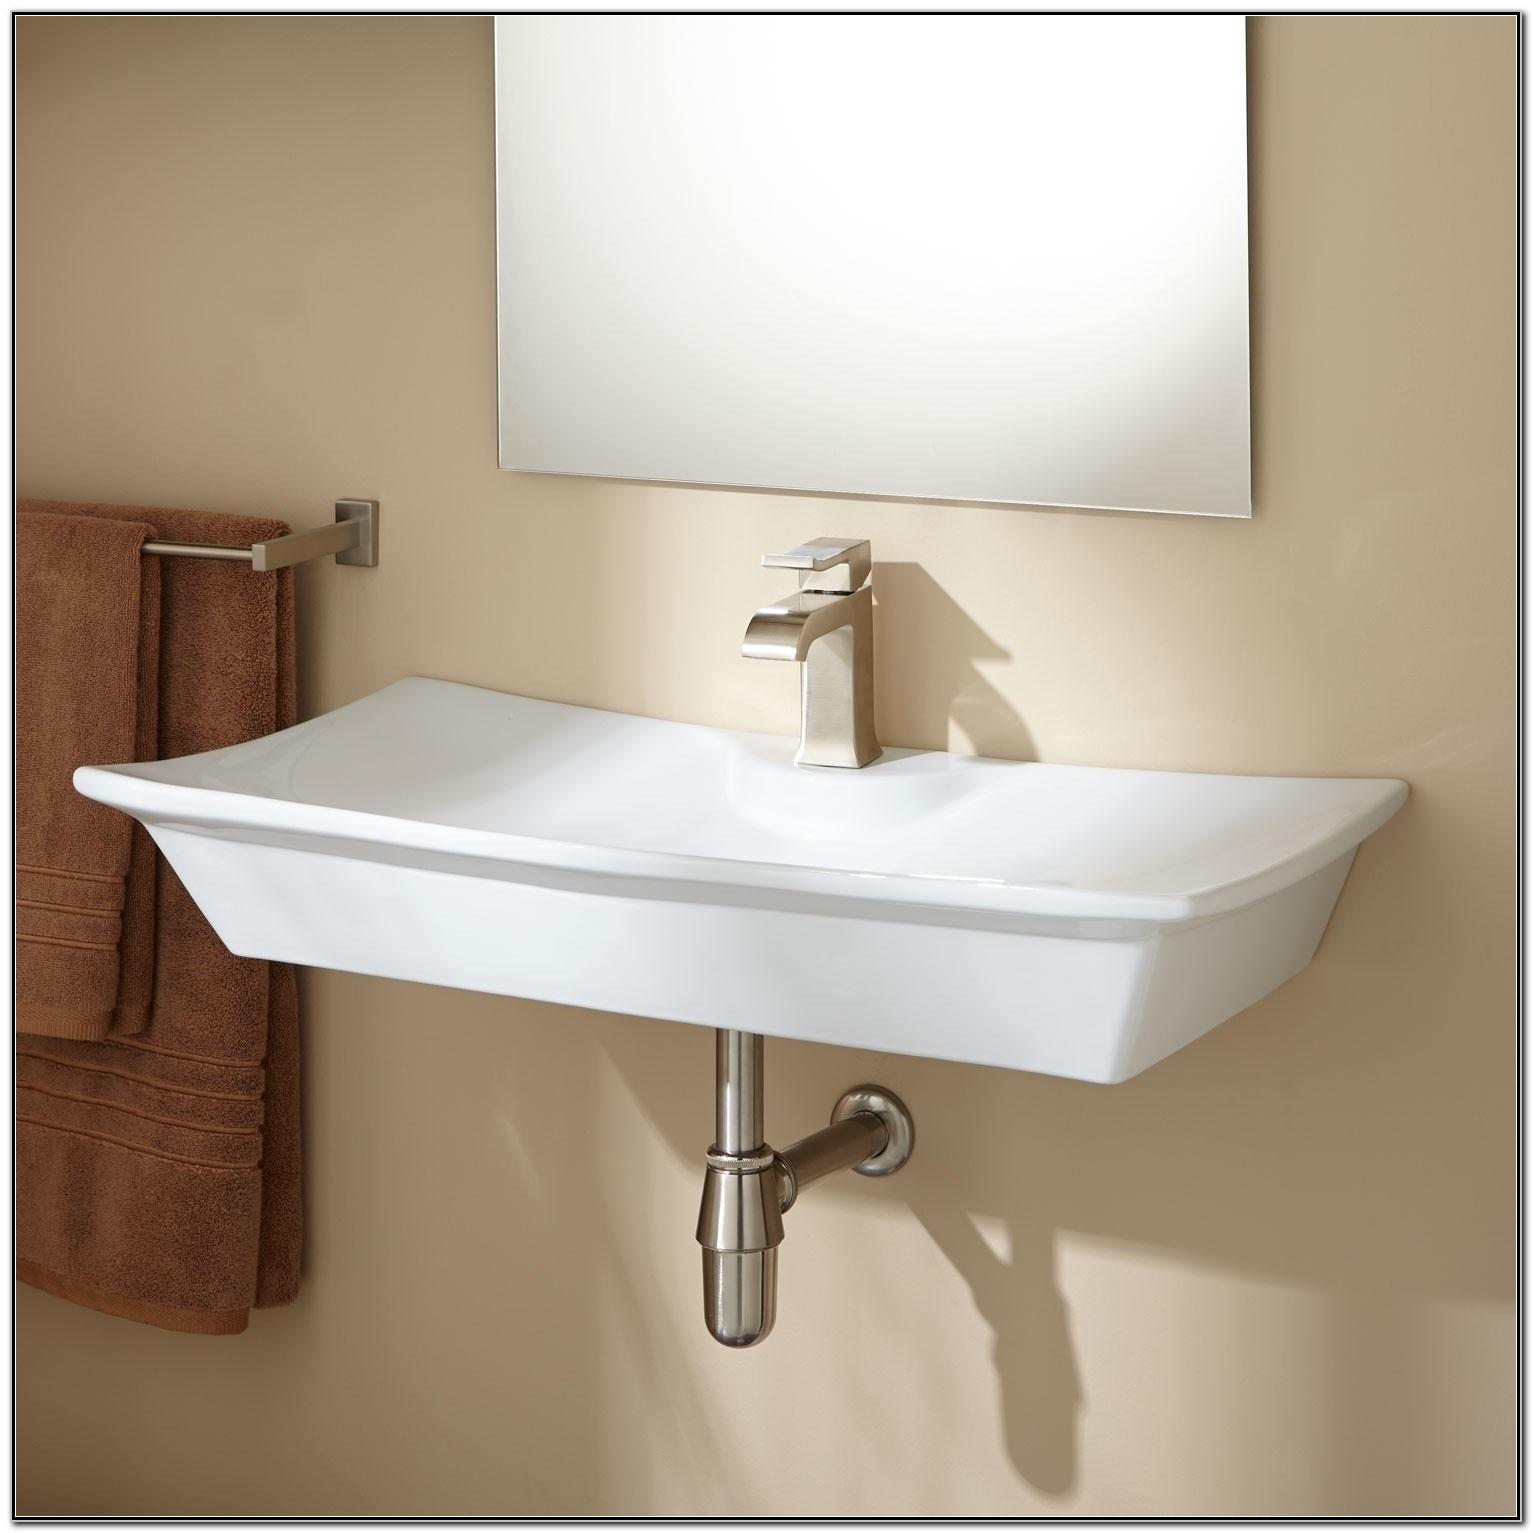 Small Wall Mounted Bath Sinks